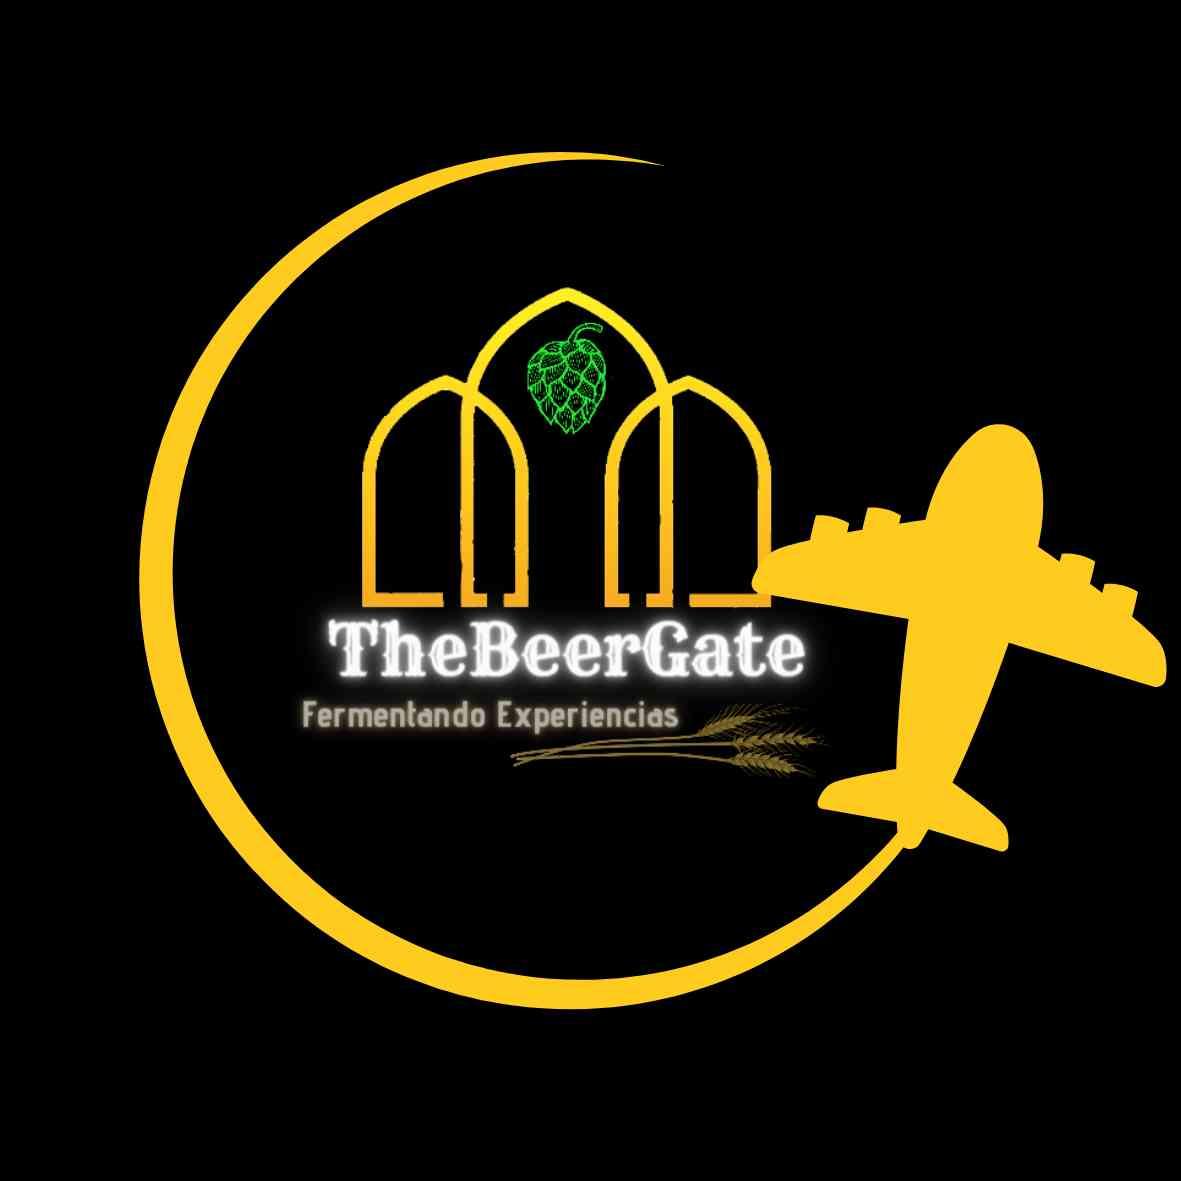 TheBeerGate